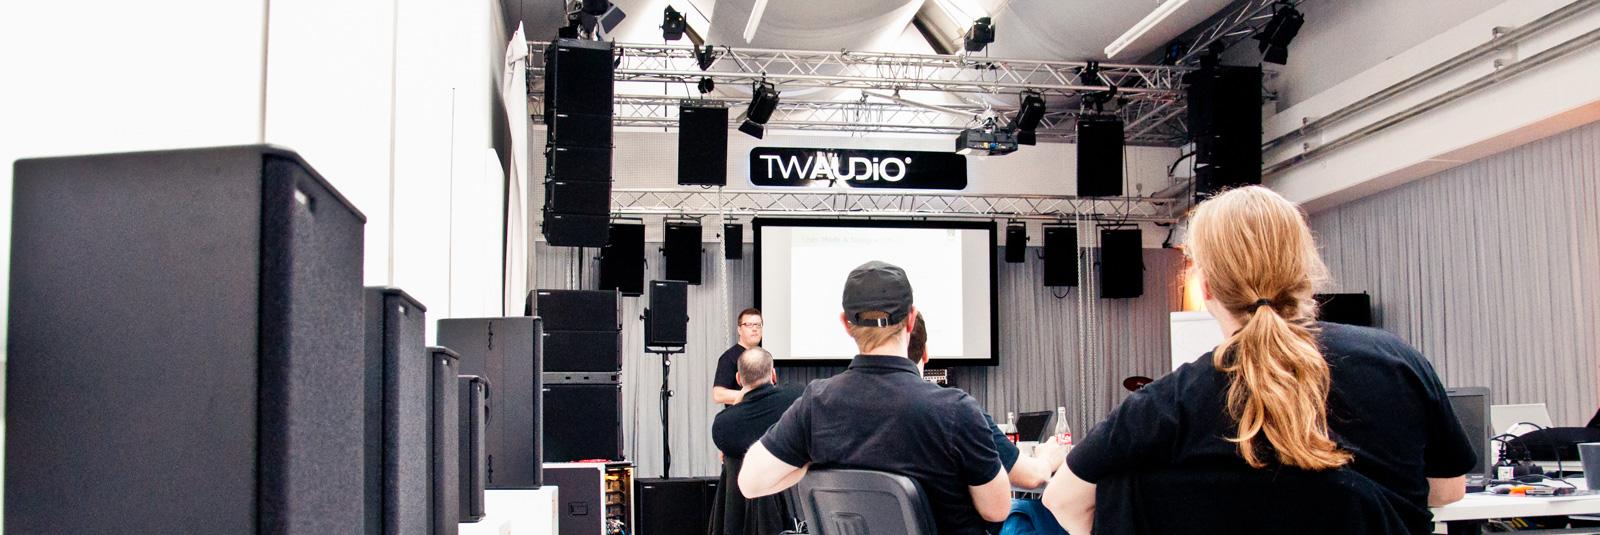 Seminar Netzwerktechnik